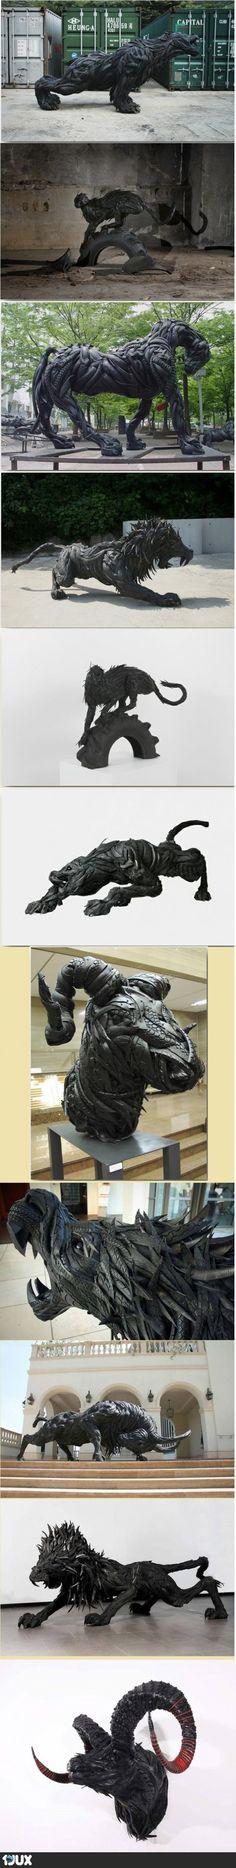 Geniale Skulpturen aus alten Autoreifen